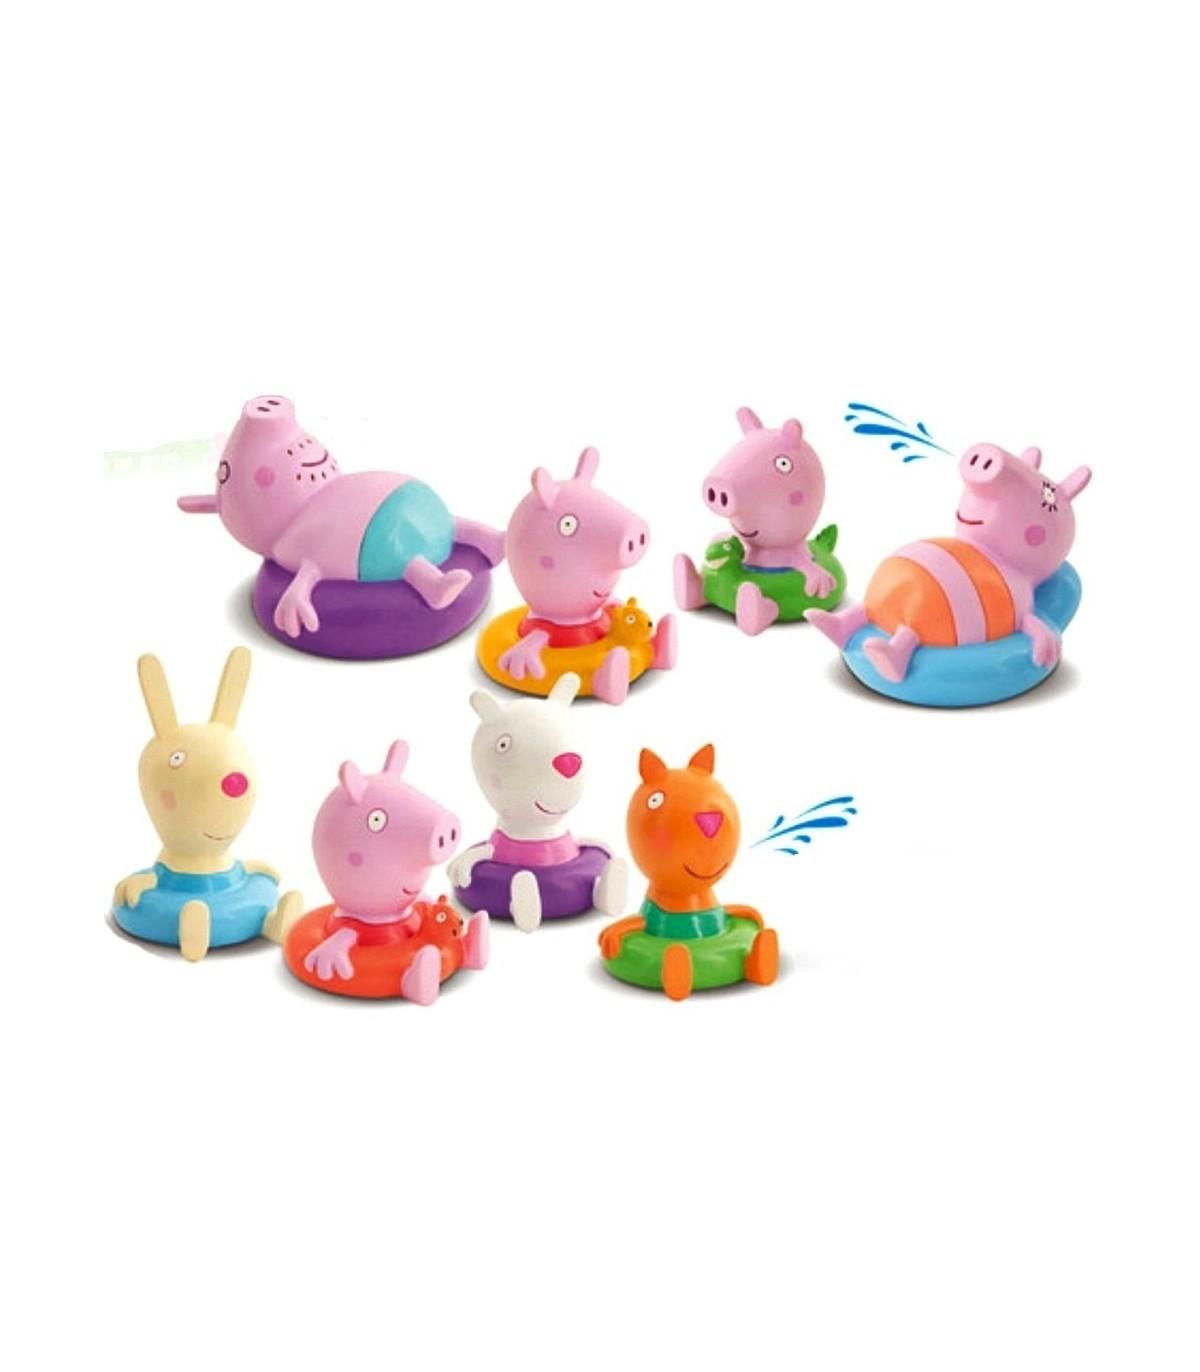 Pack 4 Figuras Bano Peppa Pig Surt Peppa Y Su Familia Peppa Y